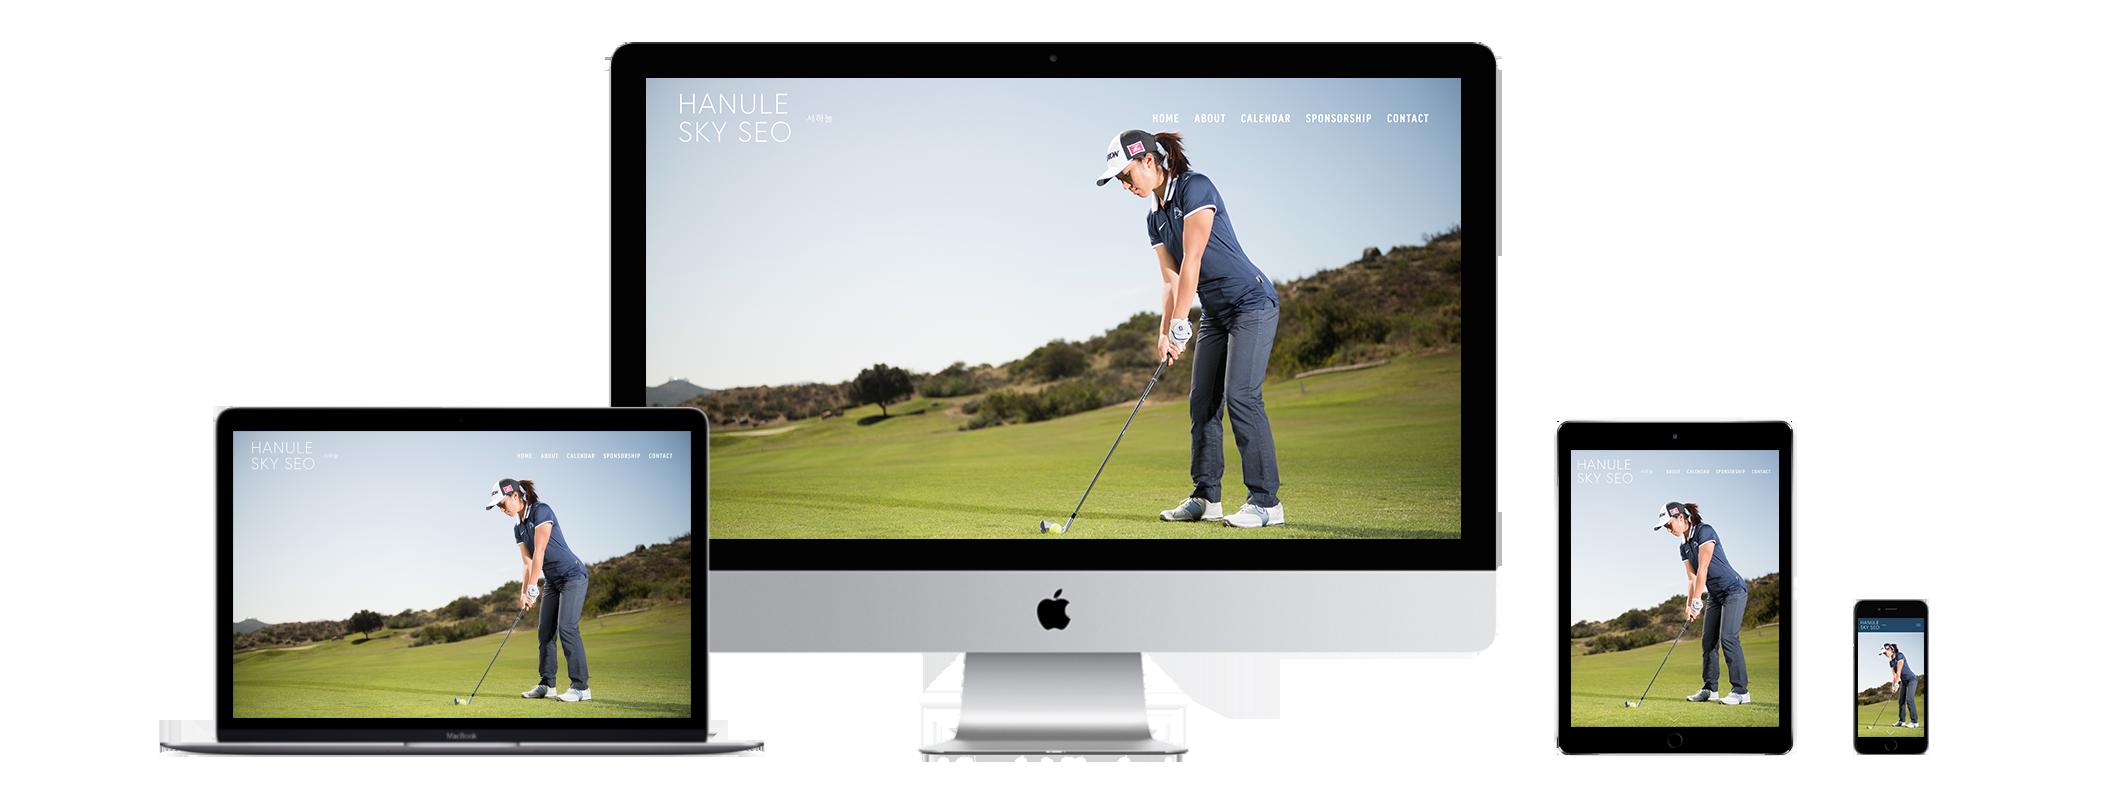 XYZ Design   Hanule Sky Seo Website Device Displays